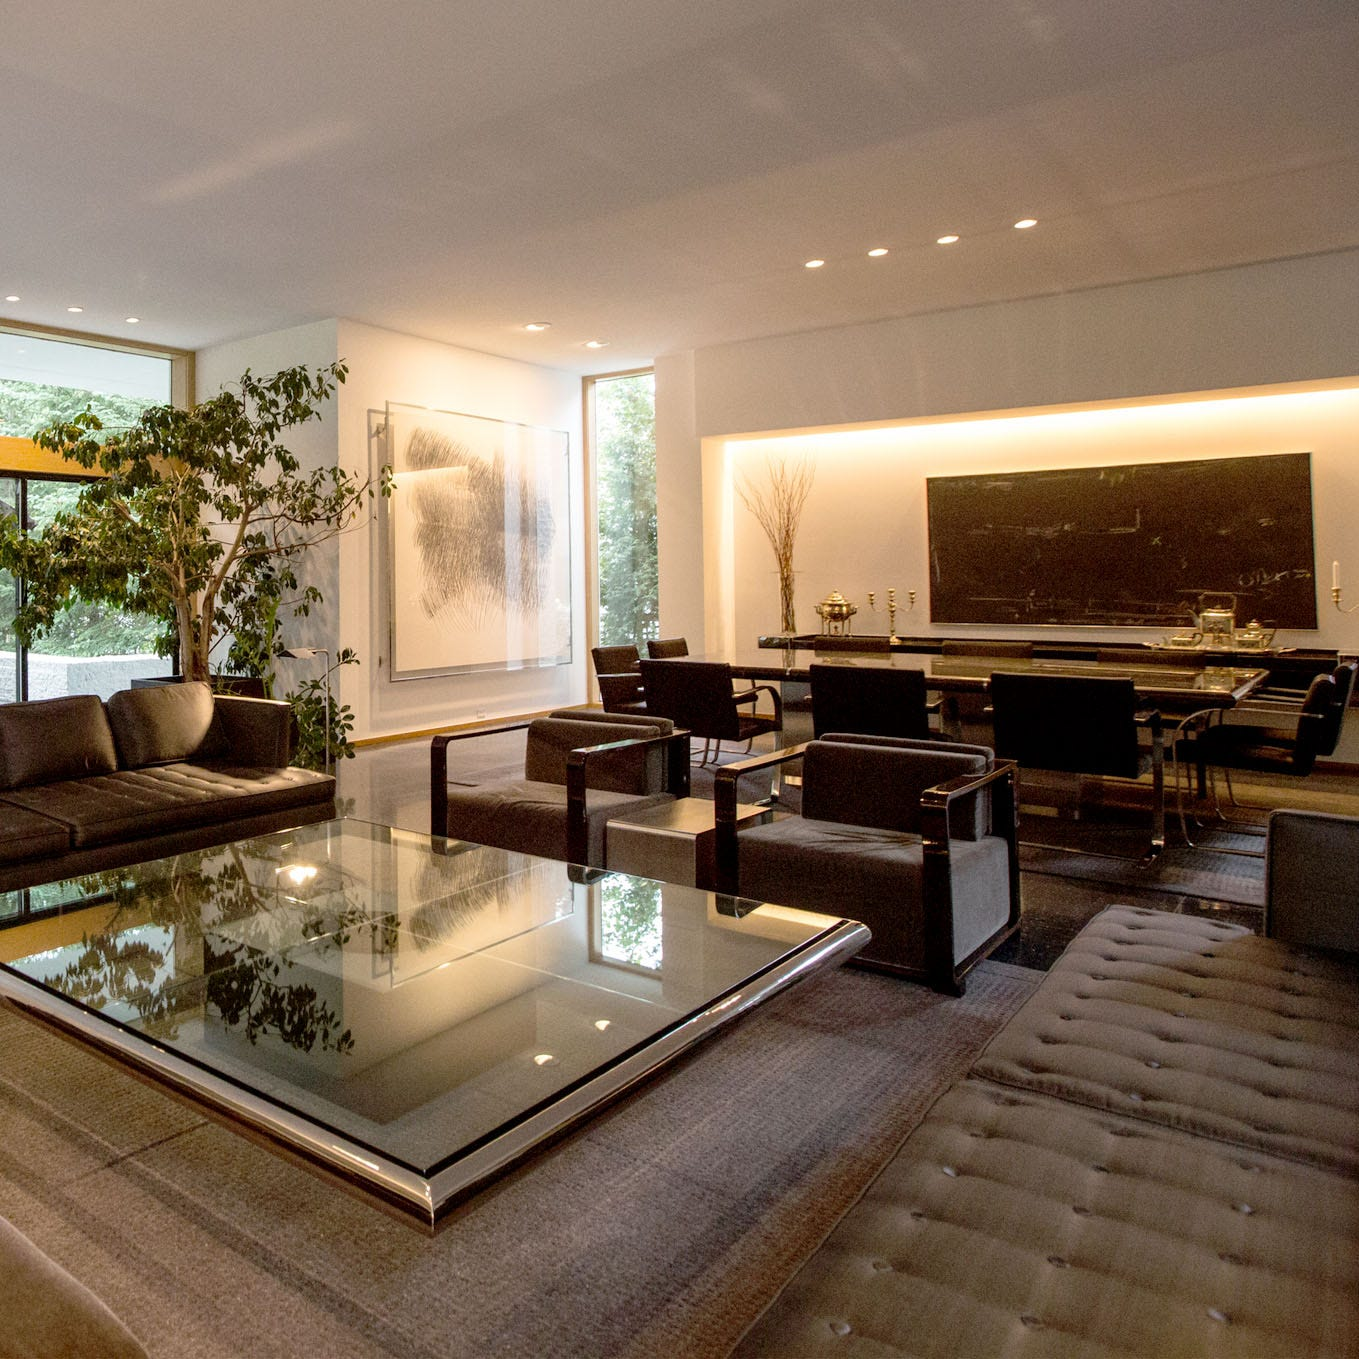 Architect Irving Tobocman's Birmingham dream home for sale